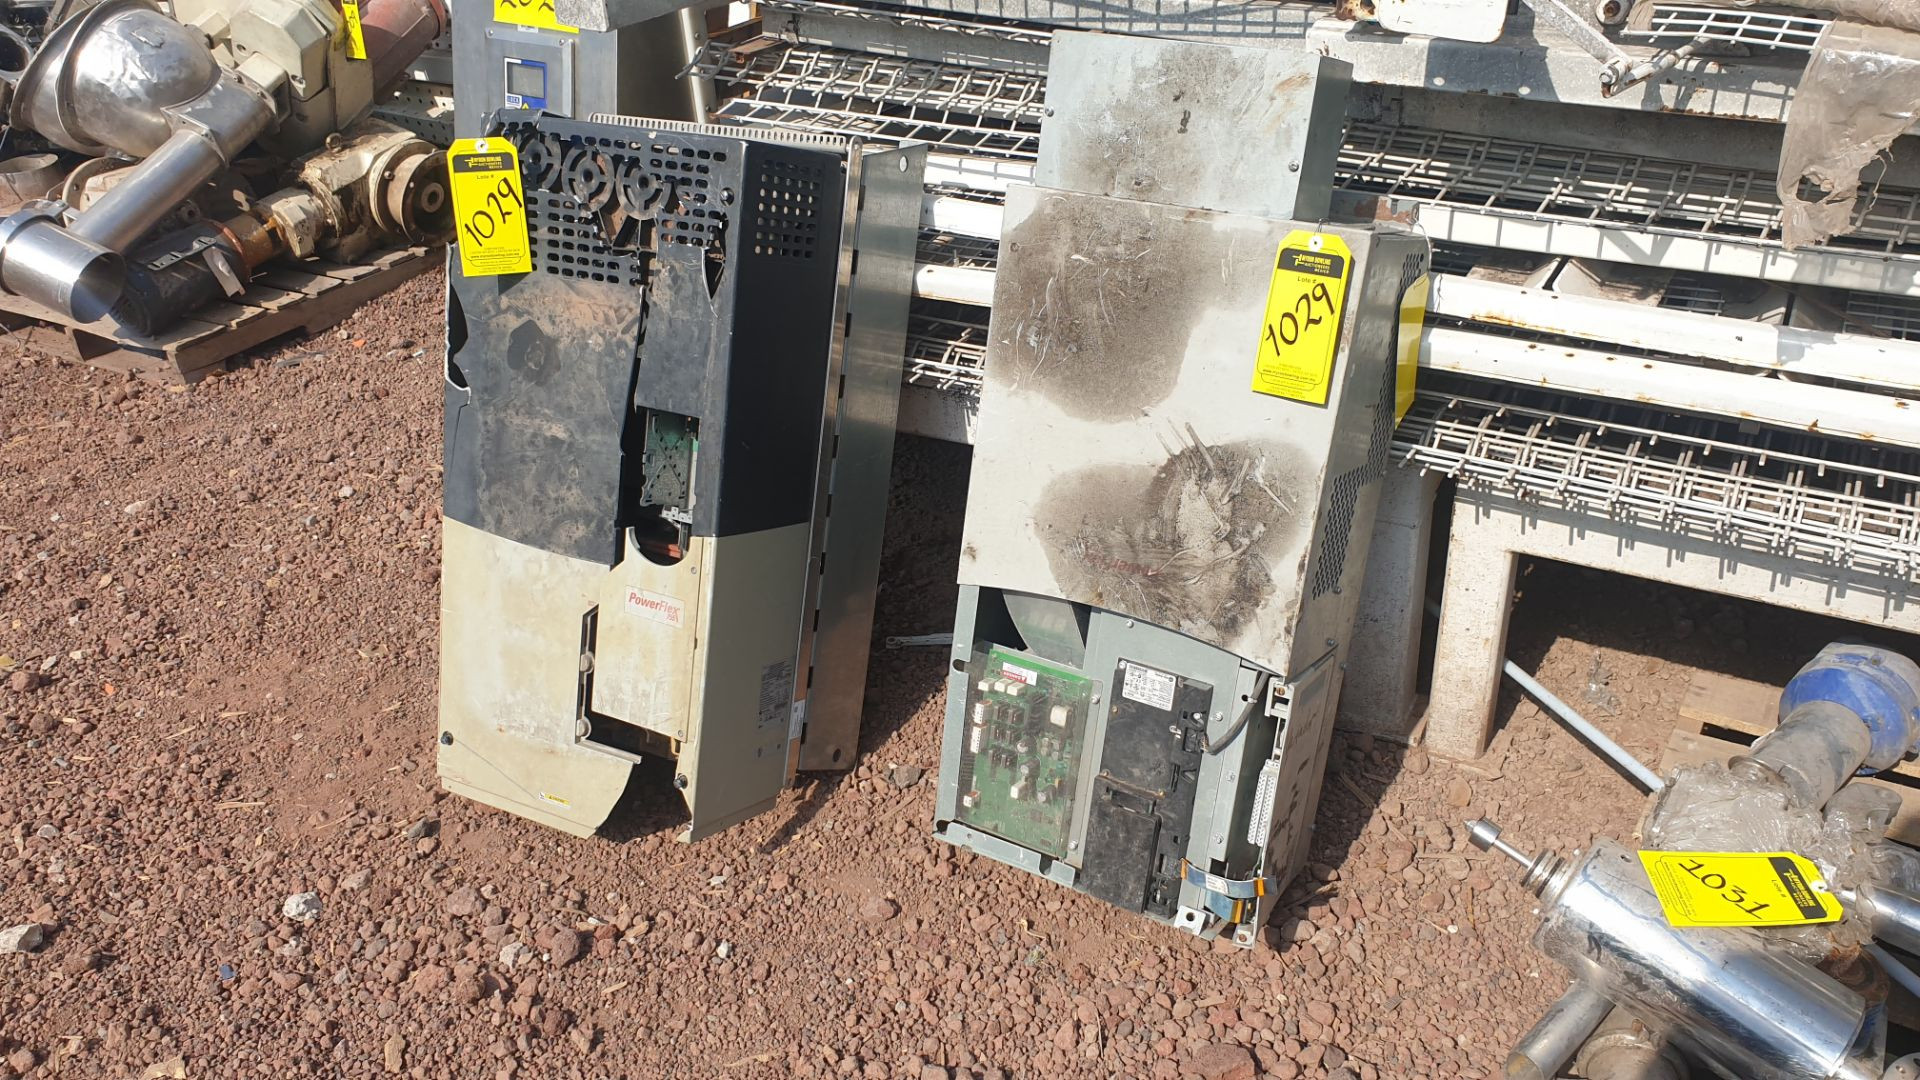 2 Powerflex Variator boards, model 20G1AN, 20BD180A0AYNANC0 - Image 2 of 13